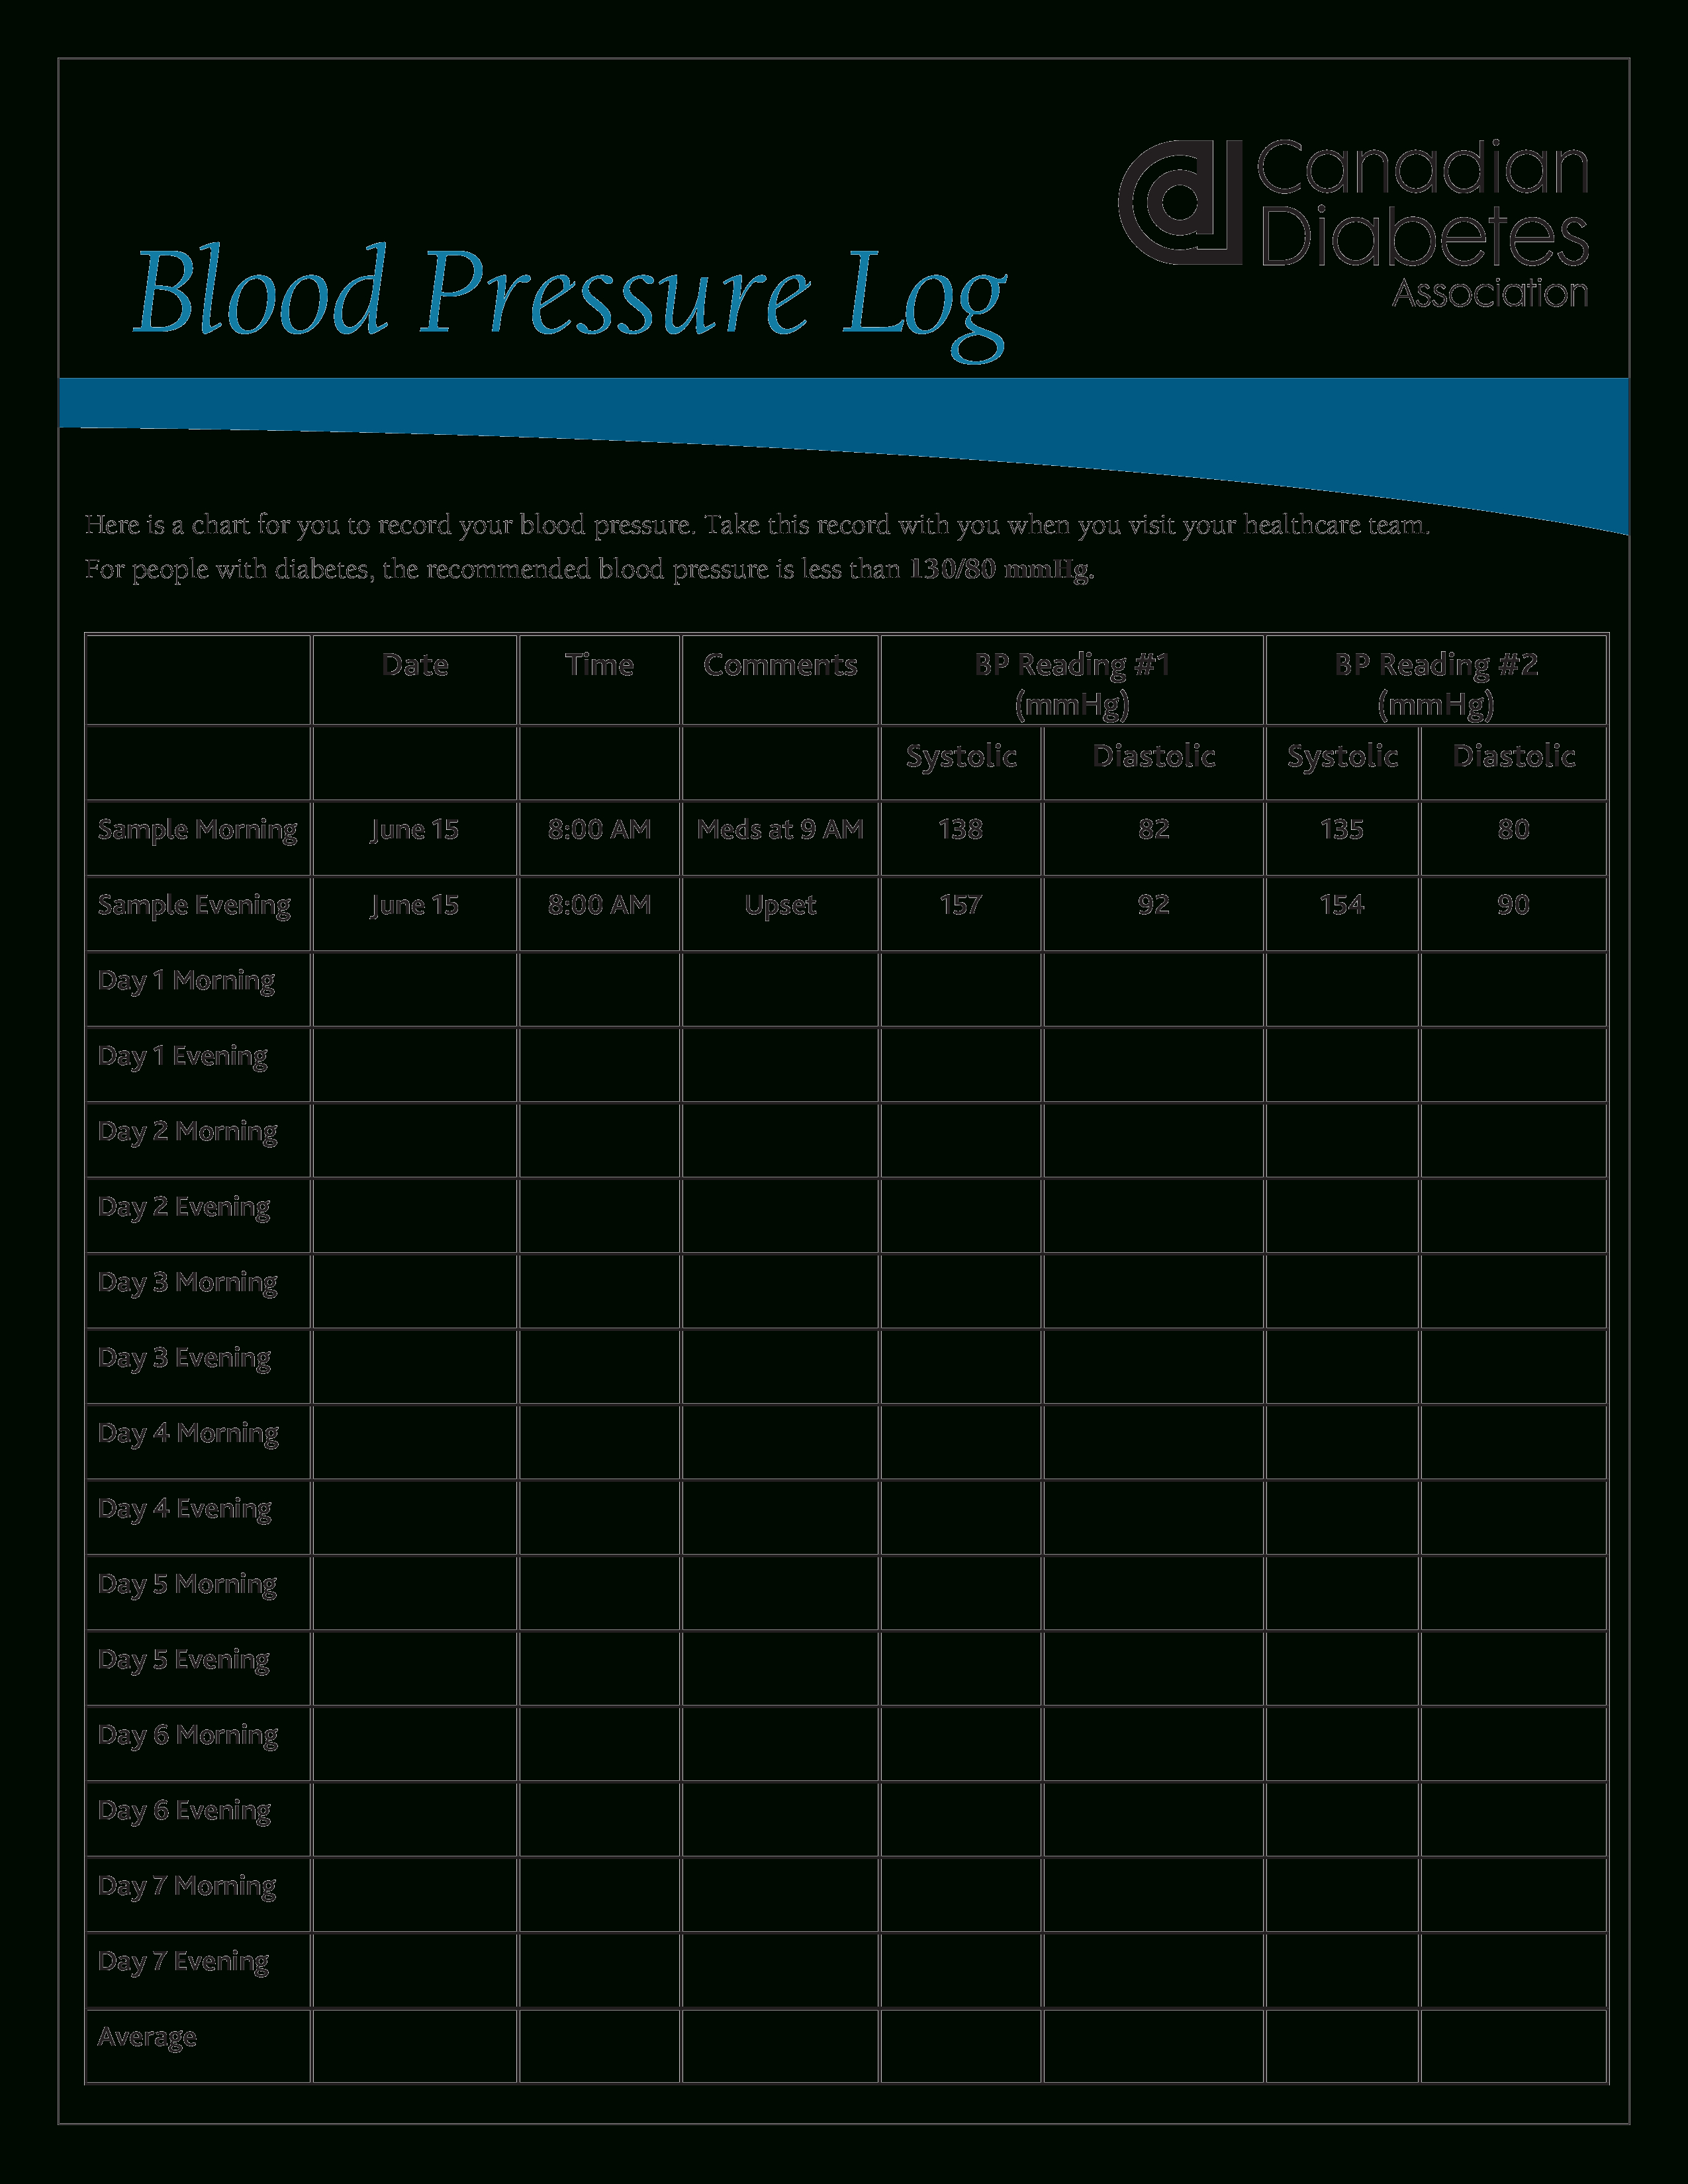 Printable Blood Pressure Log - How To Create A Blood Pressure Log - Free Printable Blood Sugar Log Sheet